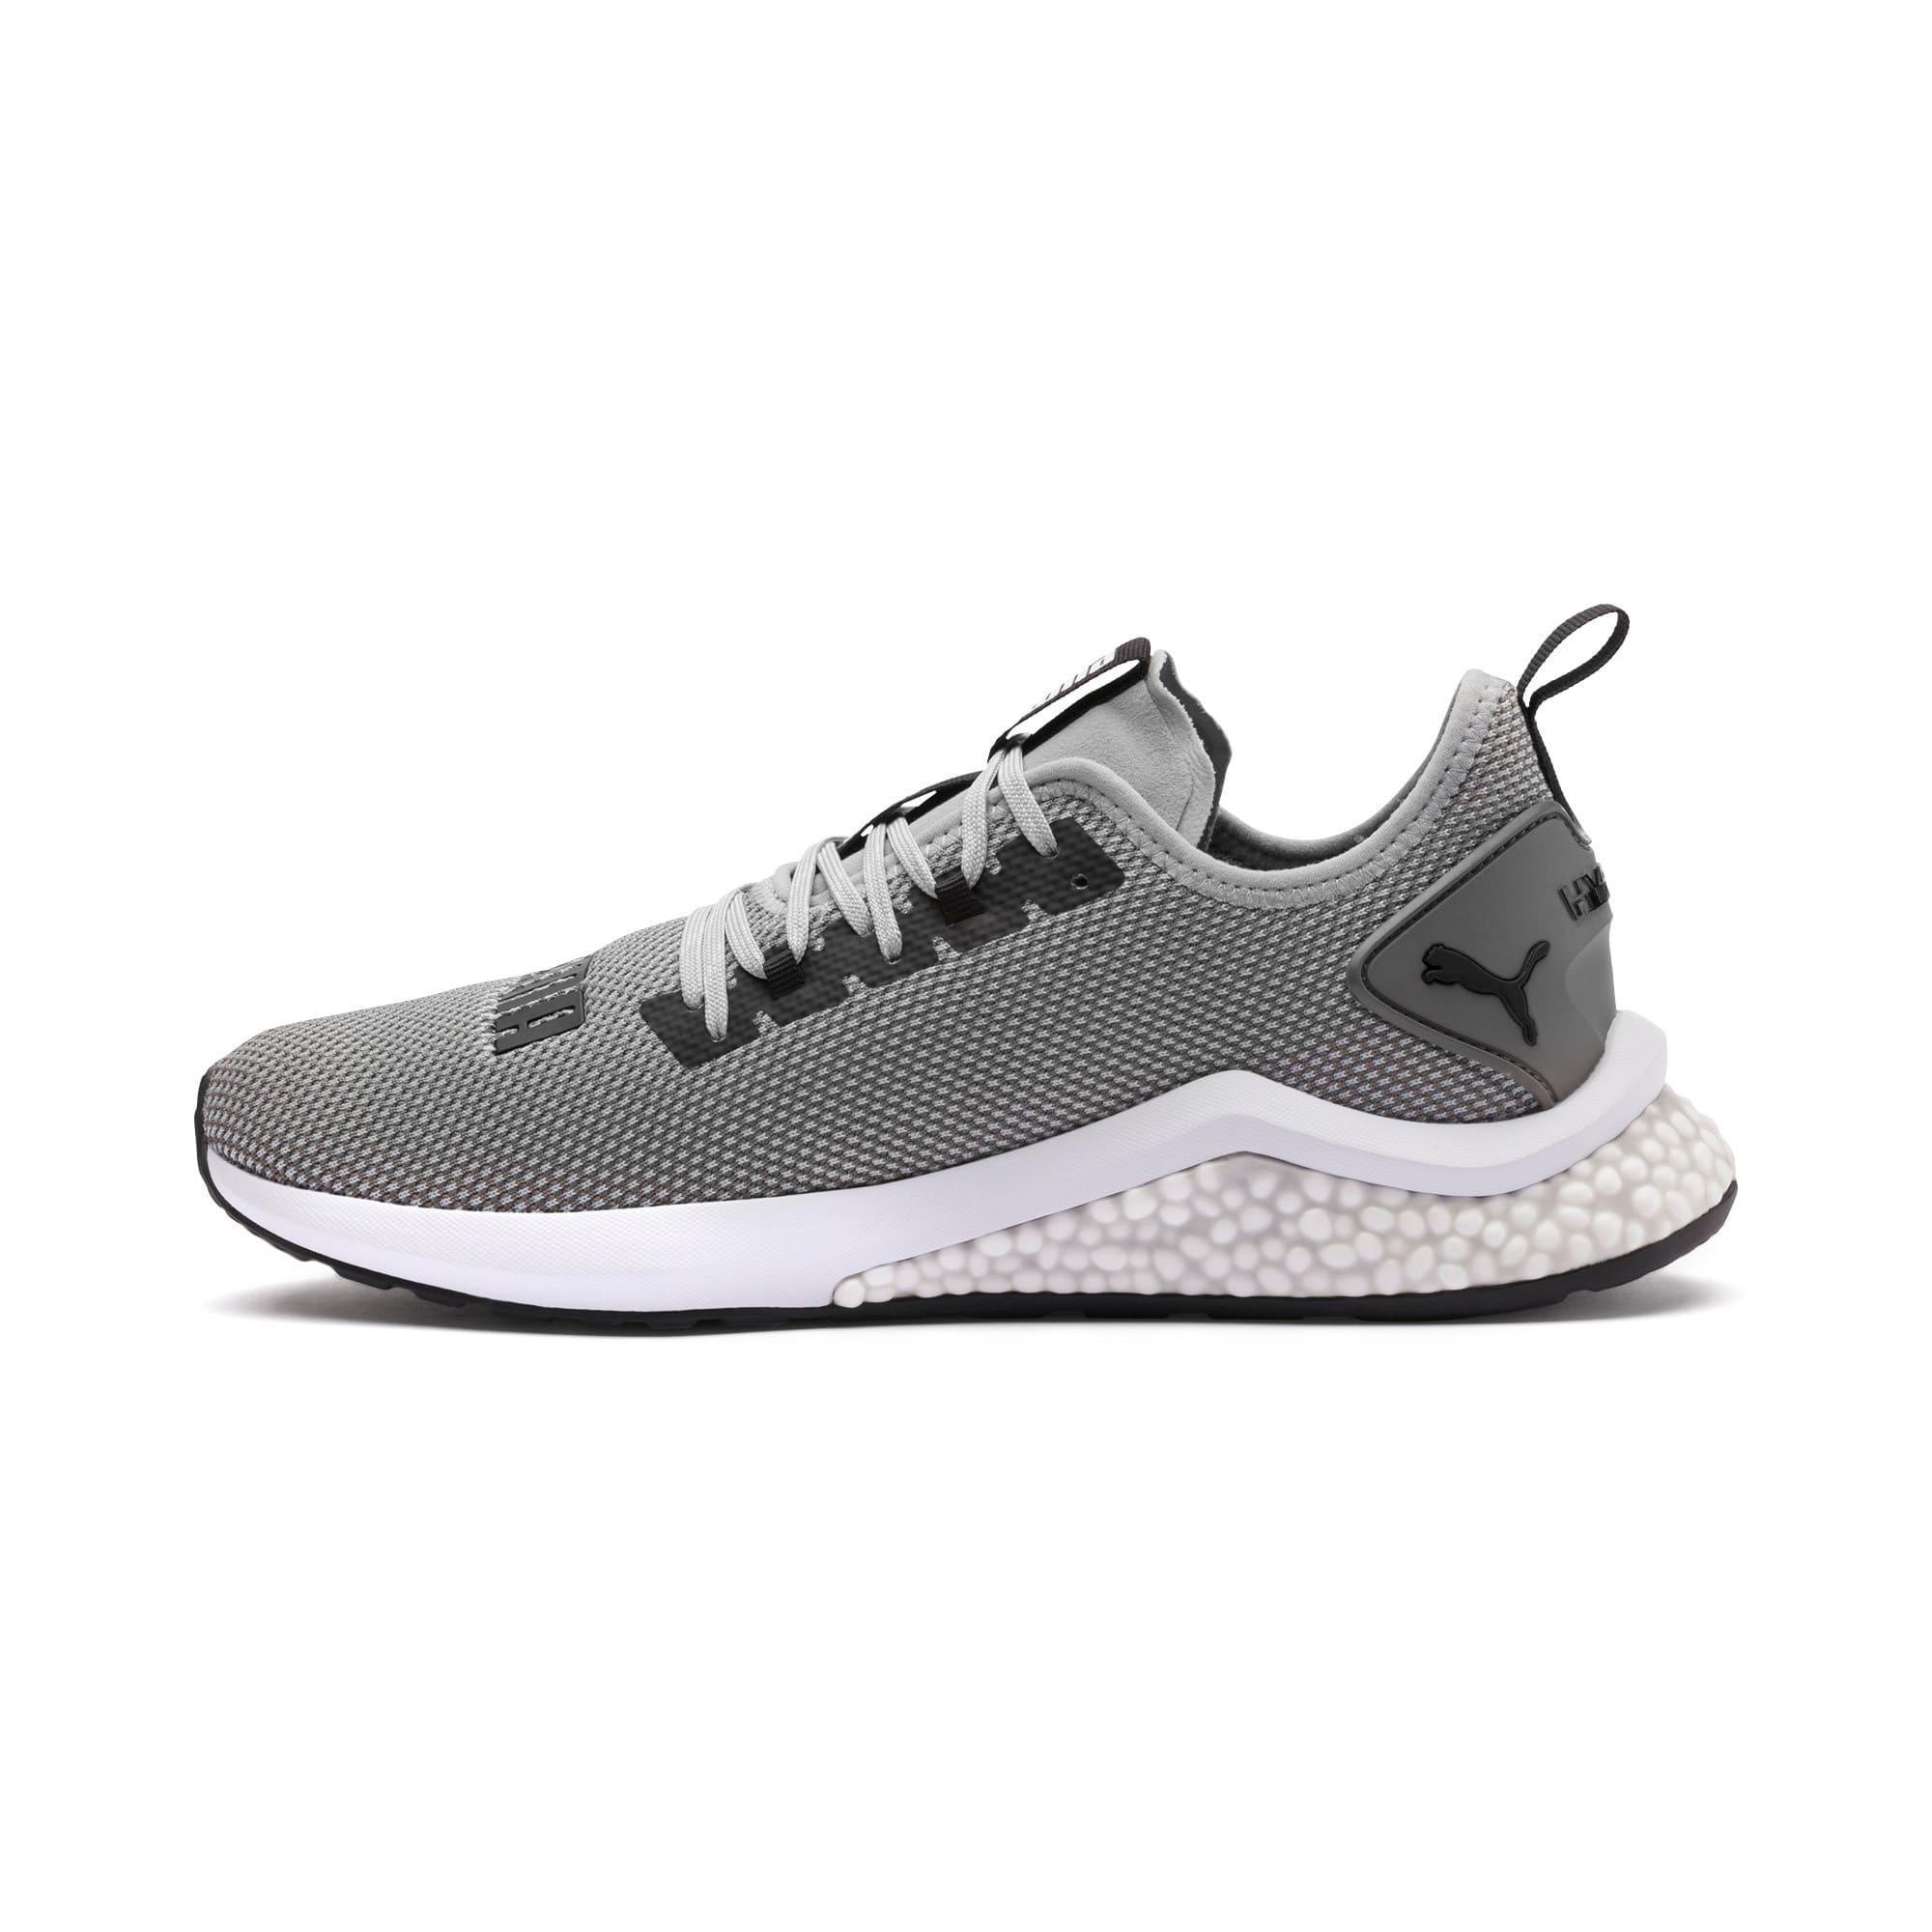 Thumbnail 1 of HYBRID NX Men's Running Shoes, Quarry-Puma White, medium